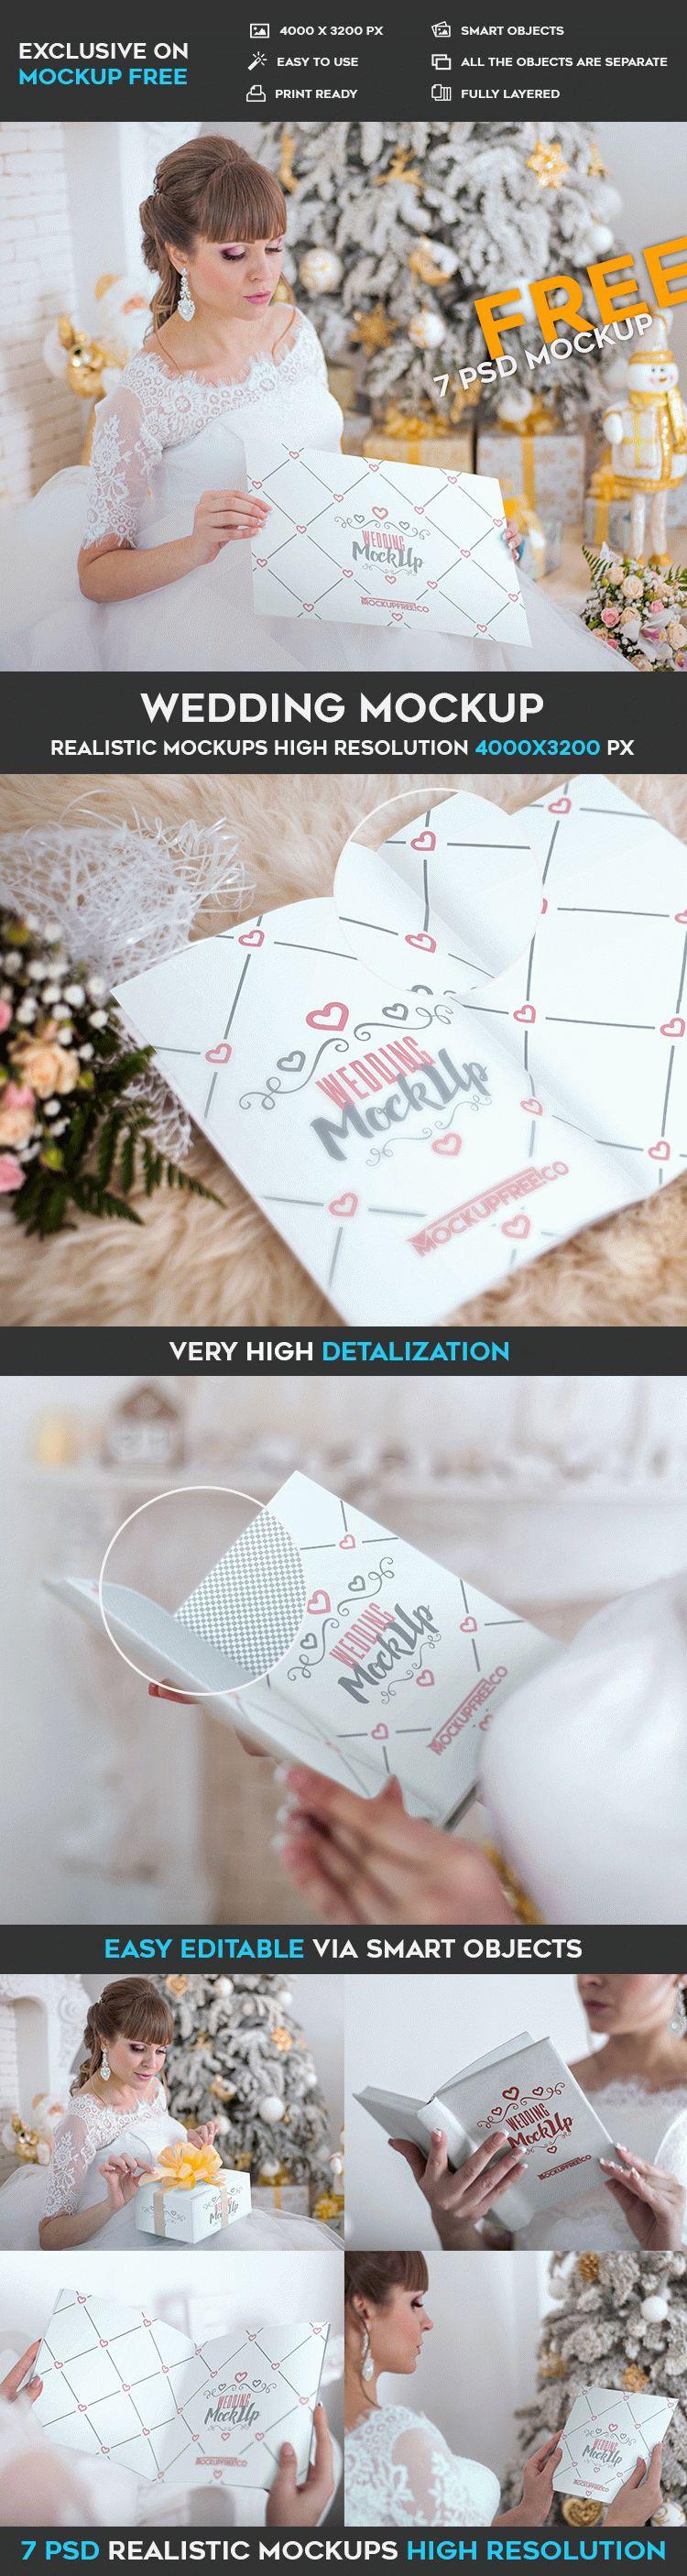 7 Free Wedding Invitation, Poster, Book PSD Mockups   Free PSD ...